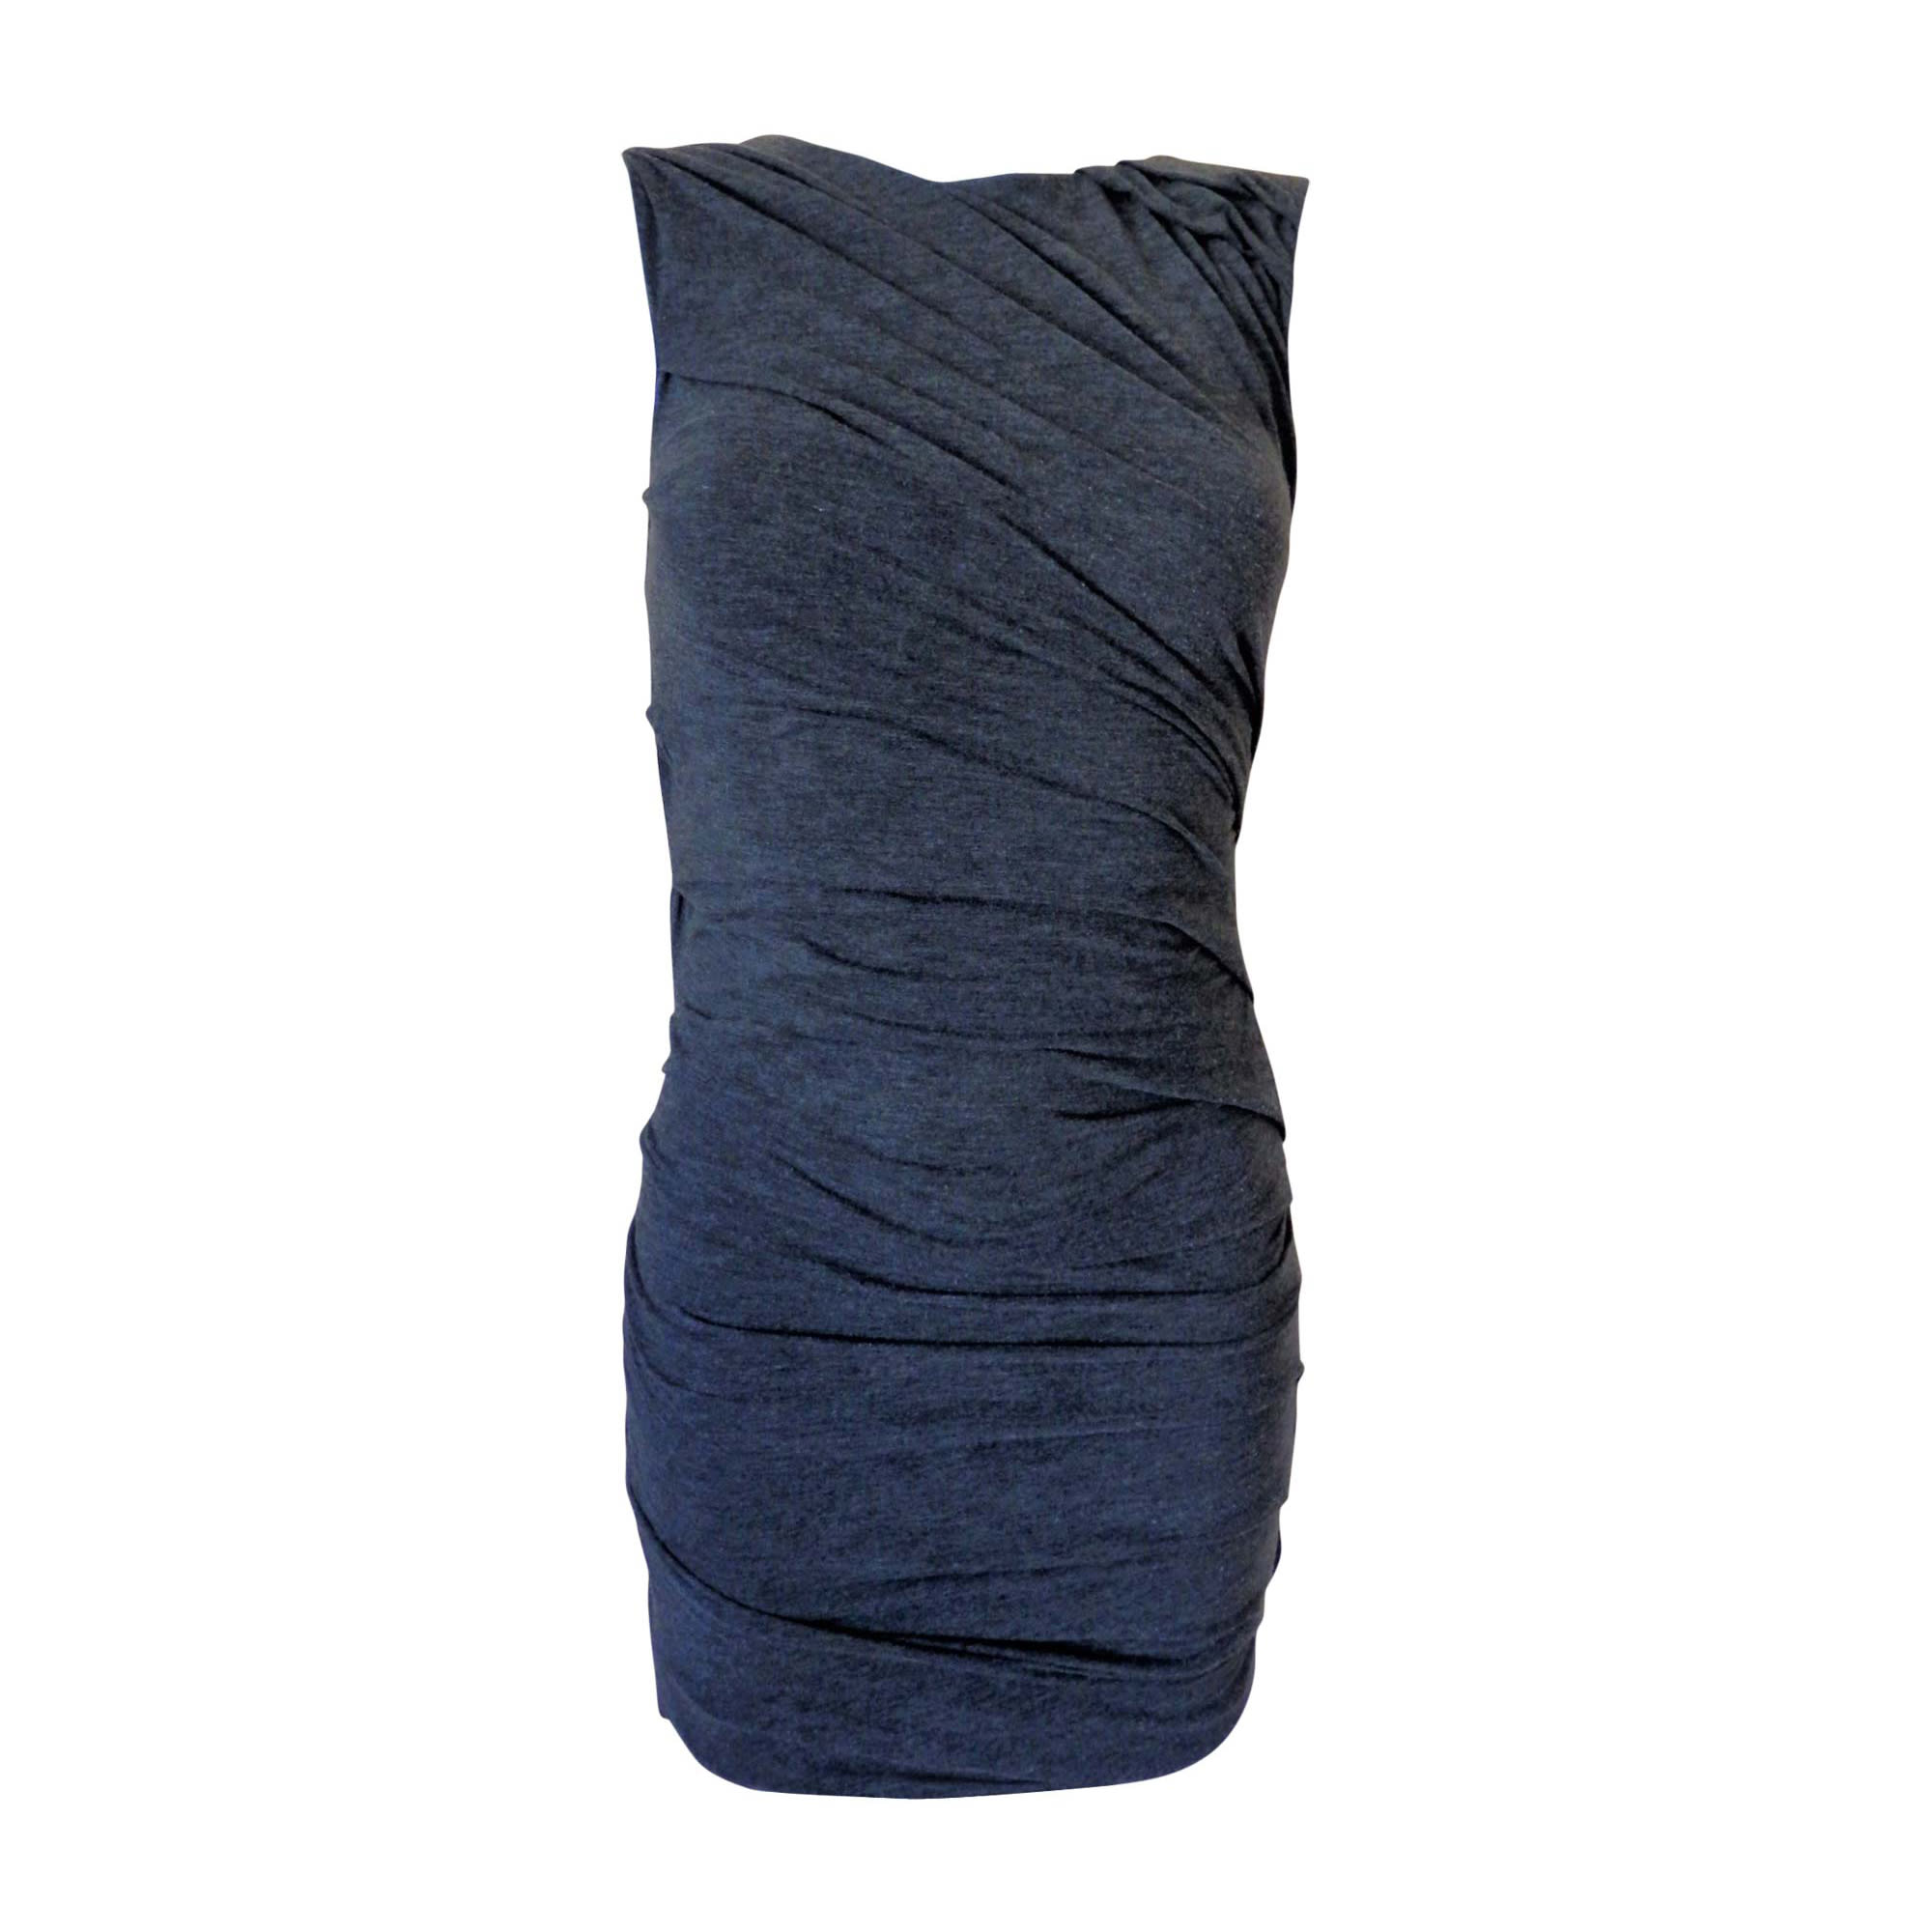 Robe courte JAY AHR Gris, anthracite